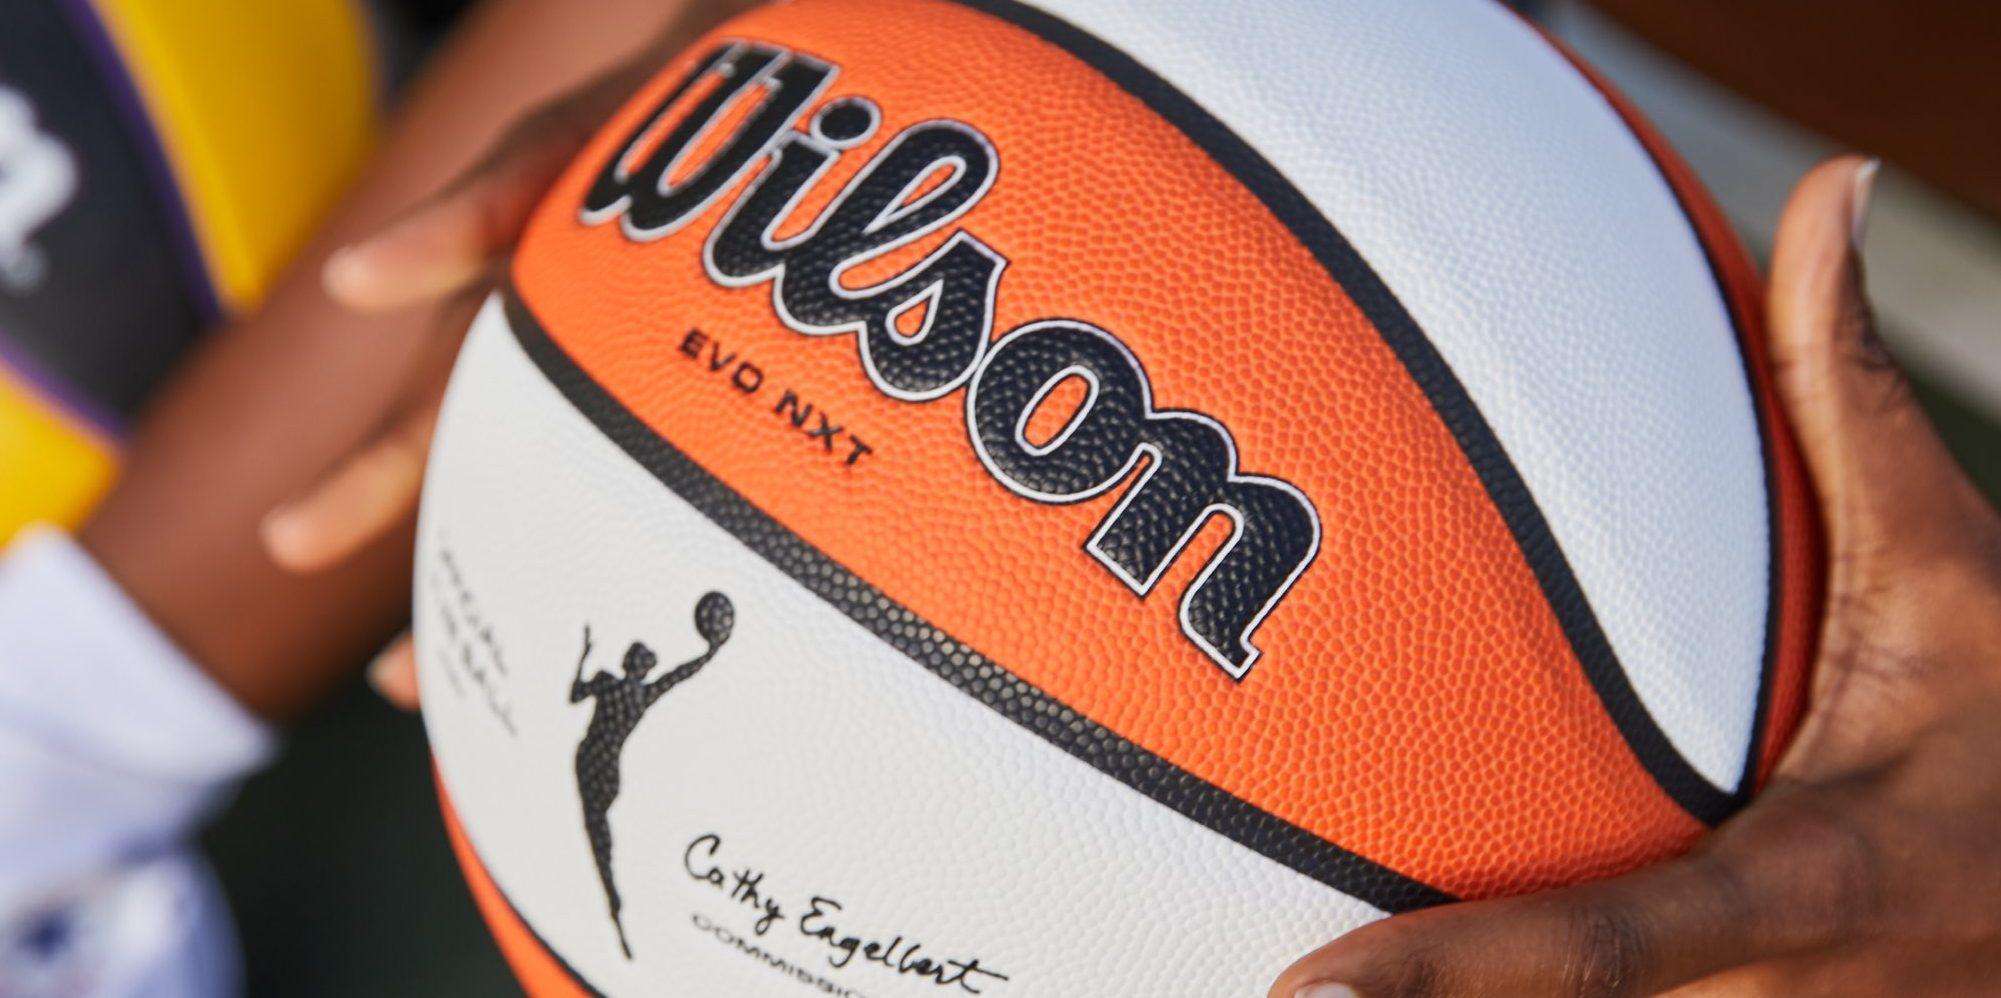 La WNBA usará un nuevo modelo de balón creado por Wilson